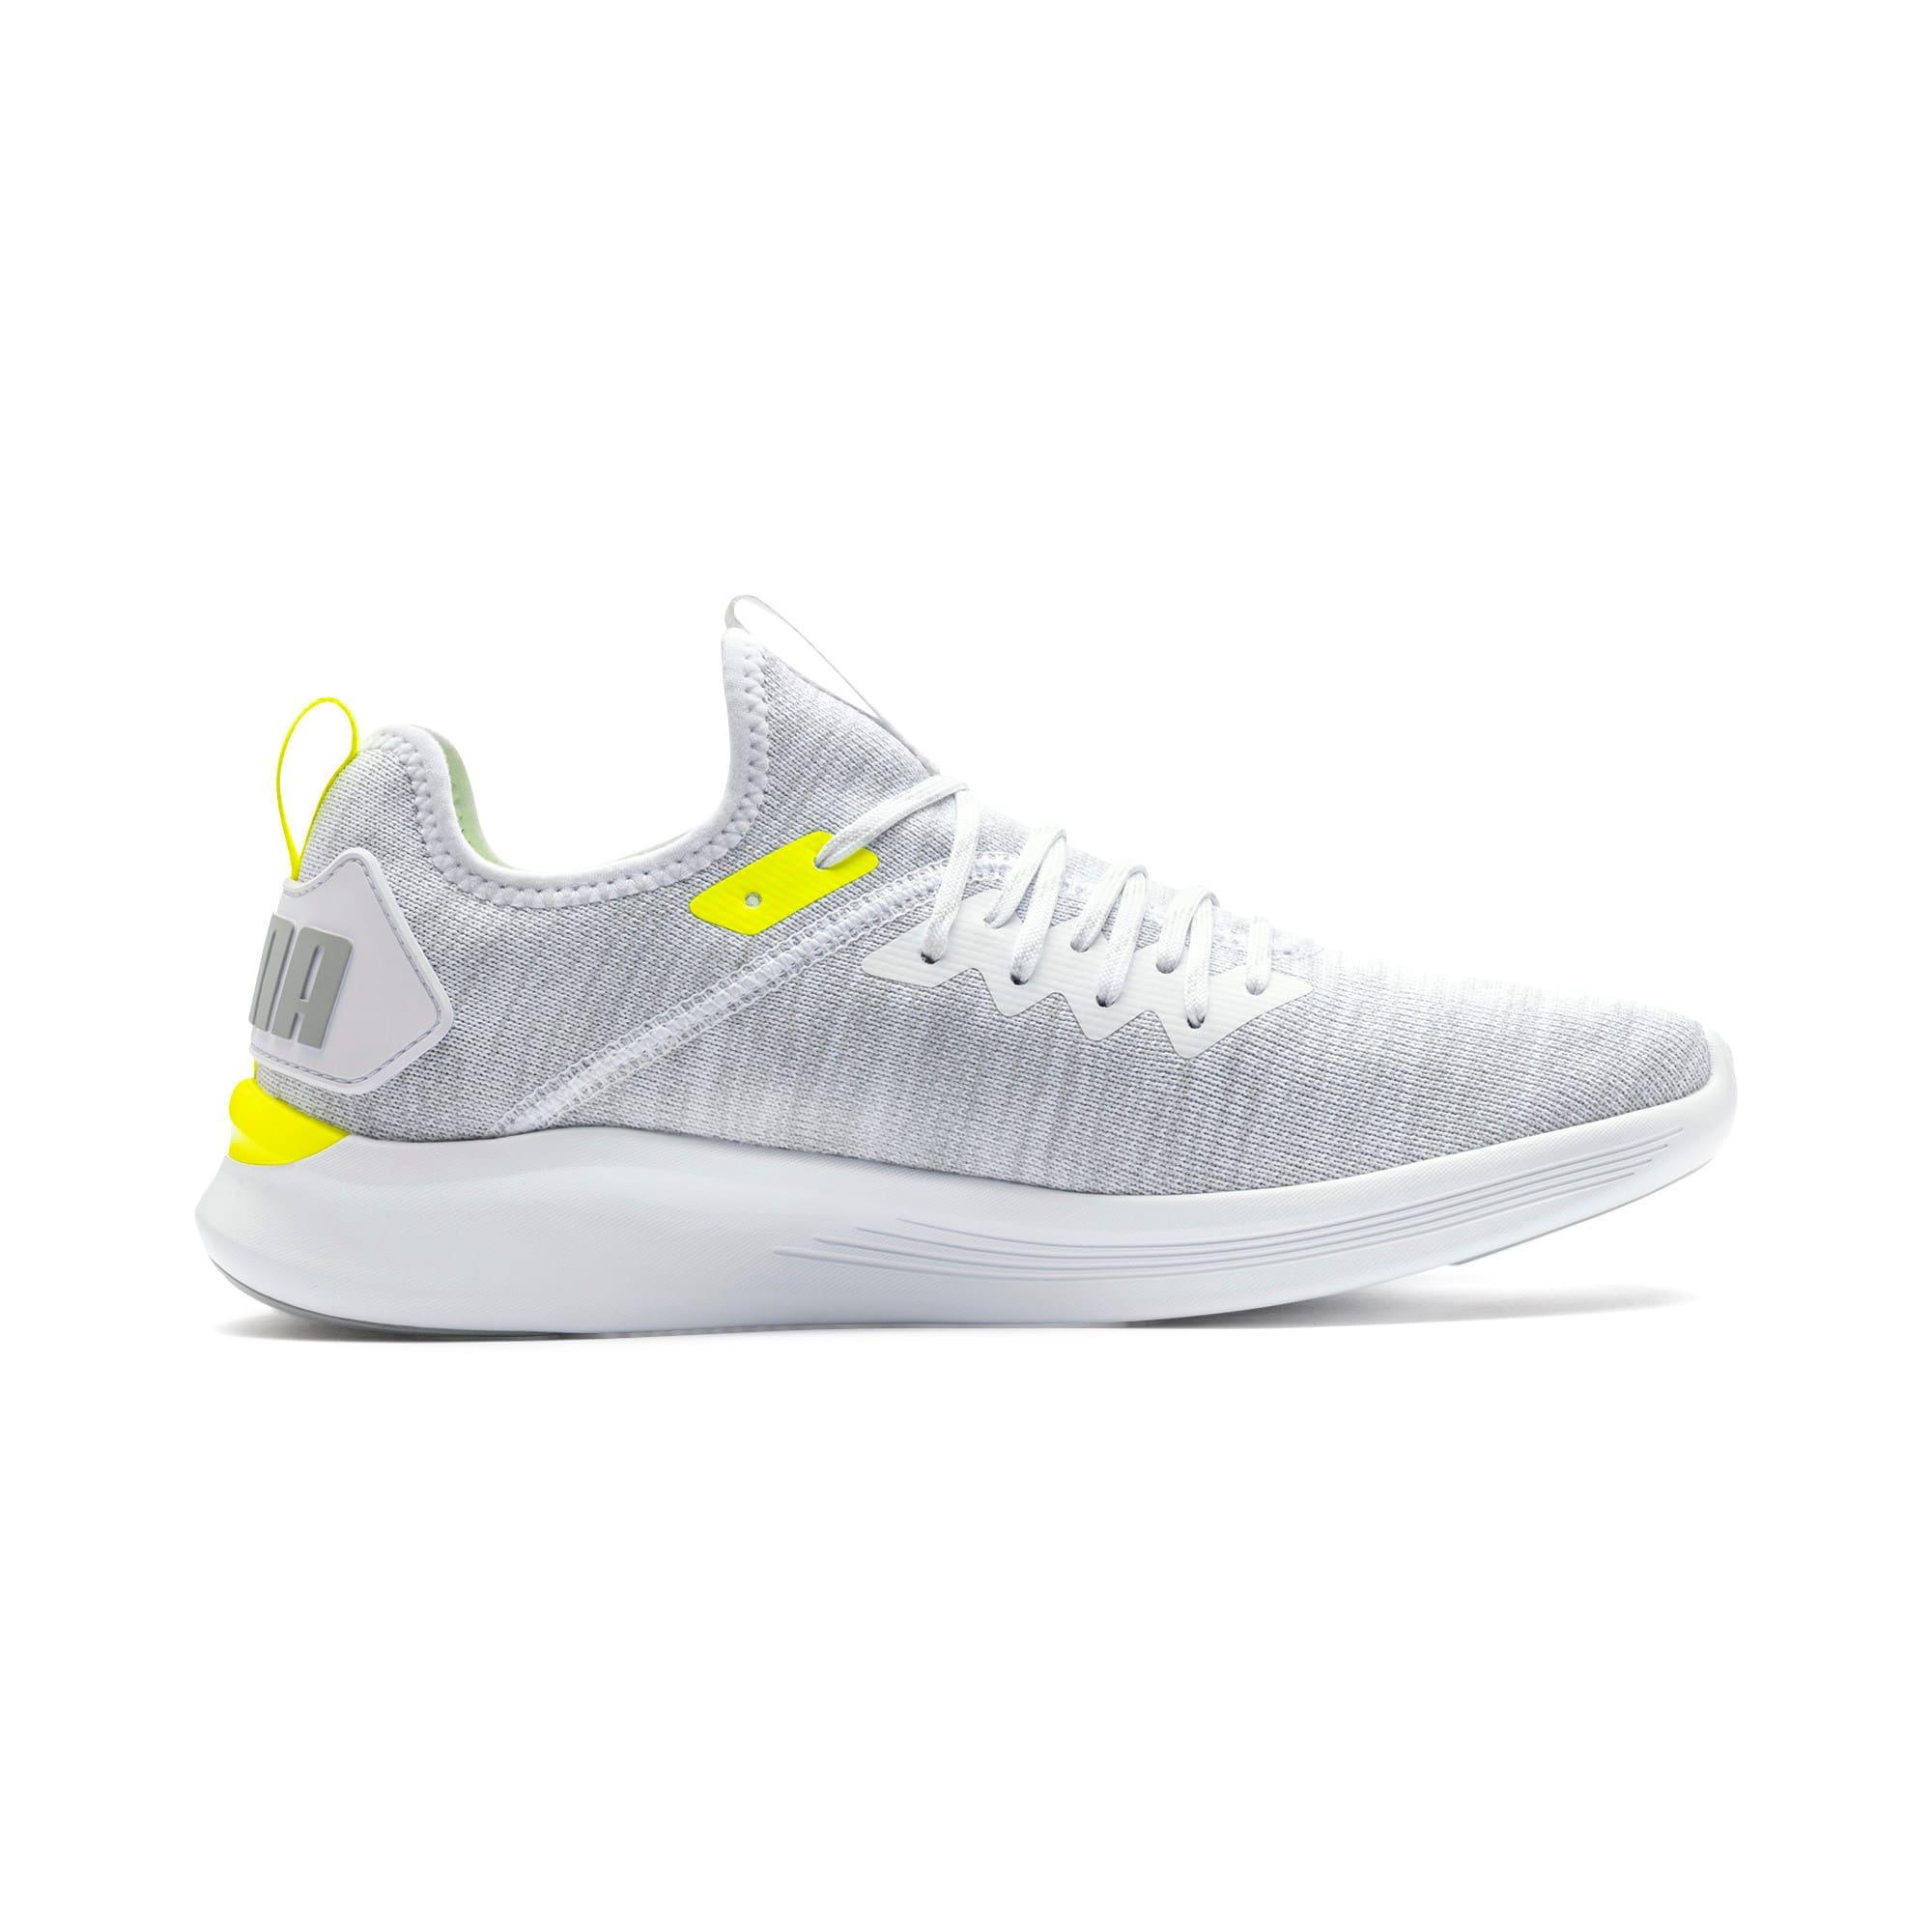 Thumbnail 3 of IGNITE Flash evoKNIT Men's Training Shoes, White-High Rise-Yellow Alert, medium-IND